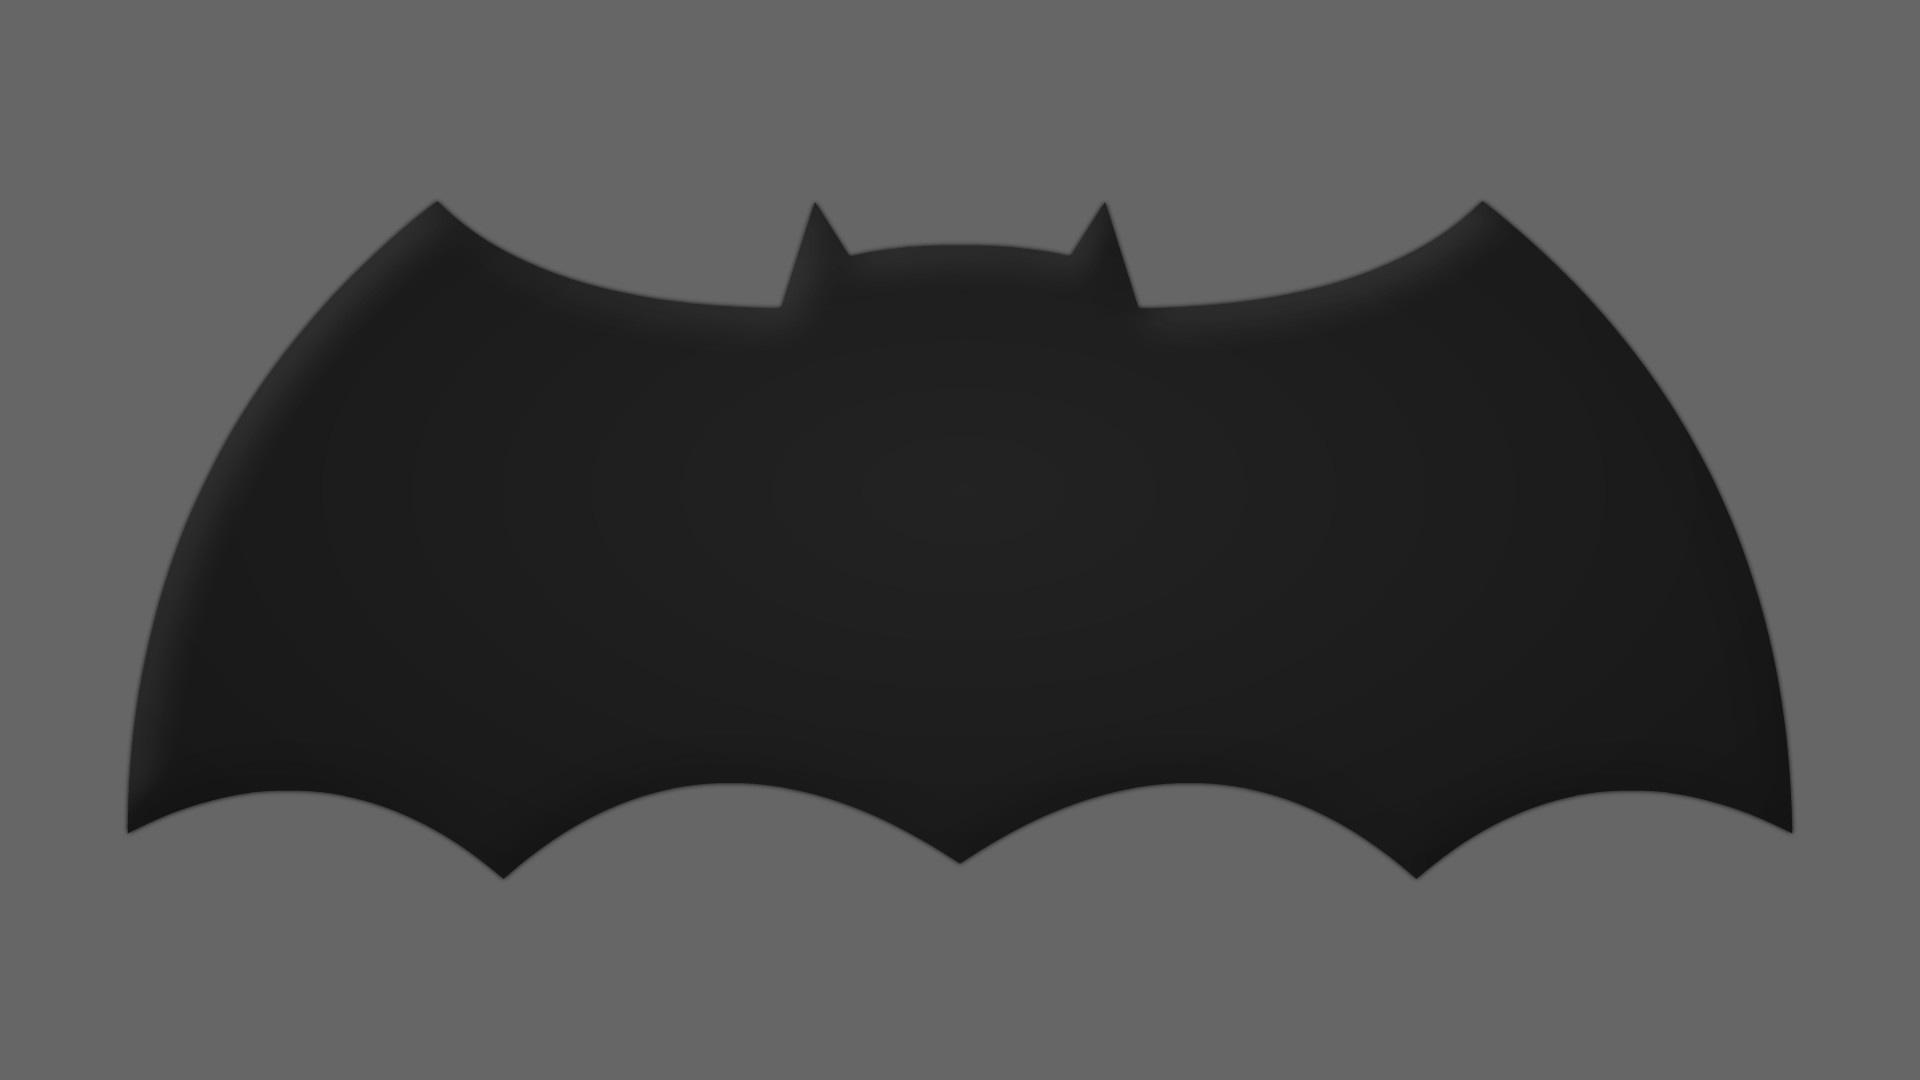 The Dark Knight Returns Wallpaper 71 Images